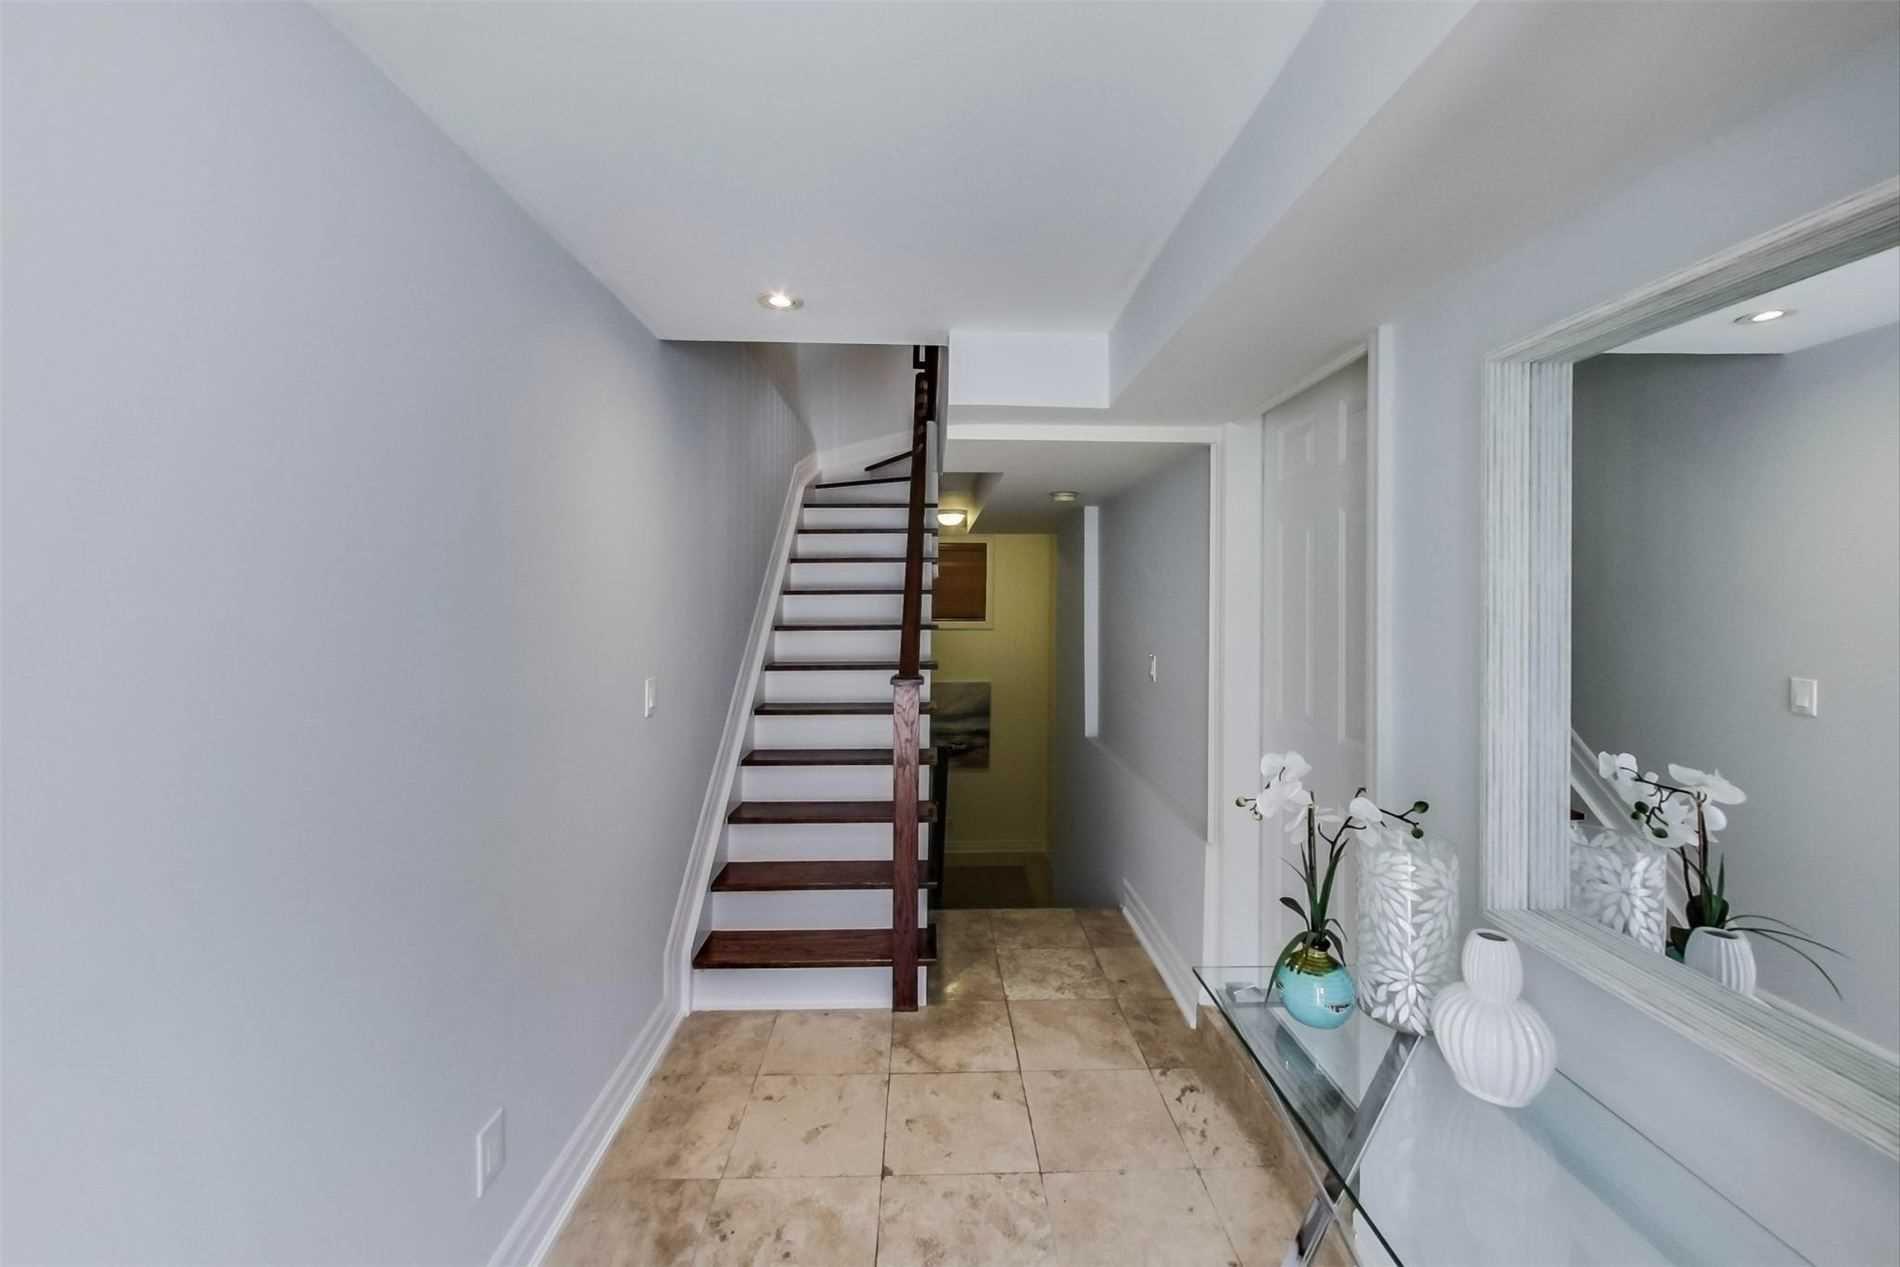 Photo 2: Photos: 213 Heward Avenue in Toronto: South Riverdale House (3-Storey) for sale (Toronto E01)  : MLS®# E4941877